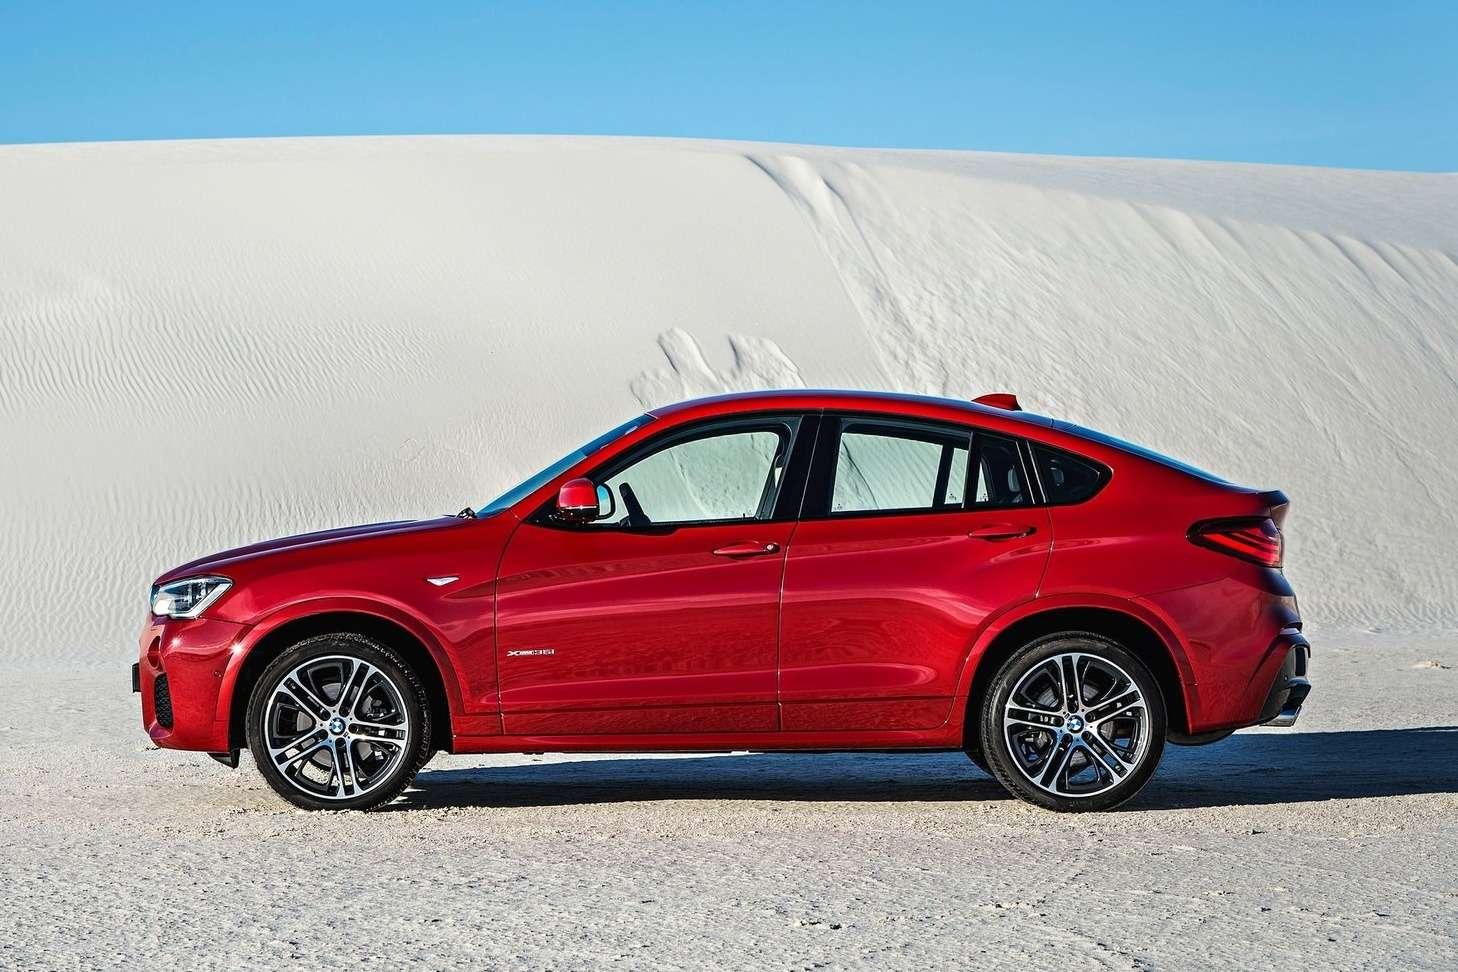 BMW-X4_2015_1600x1200_wallpaper_1c